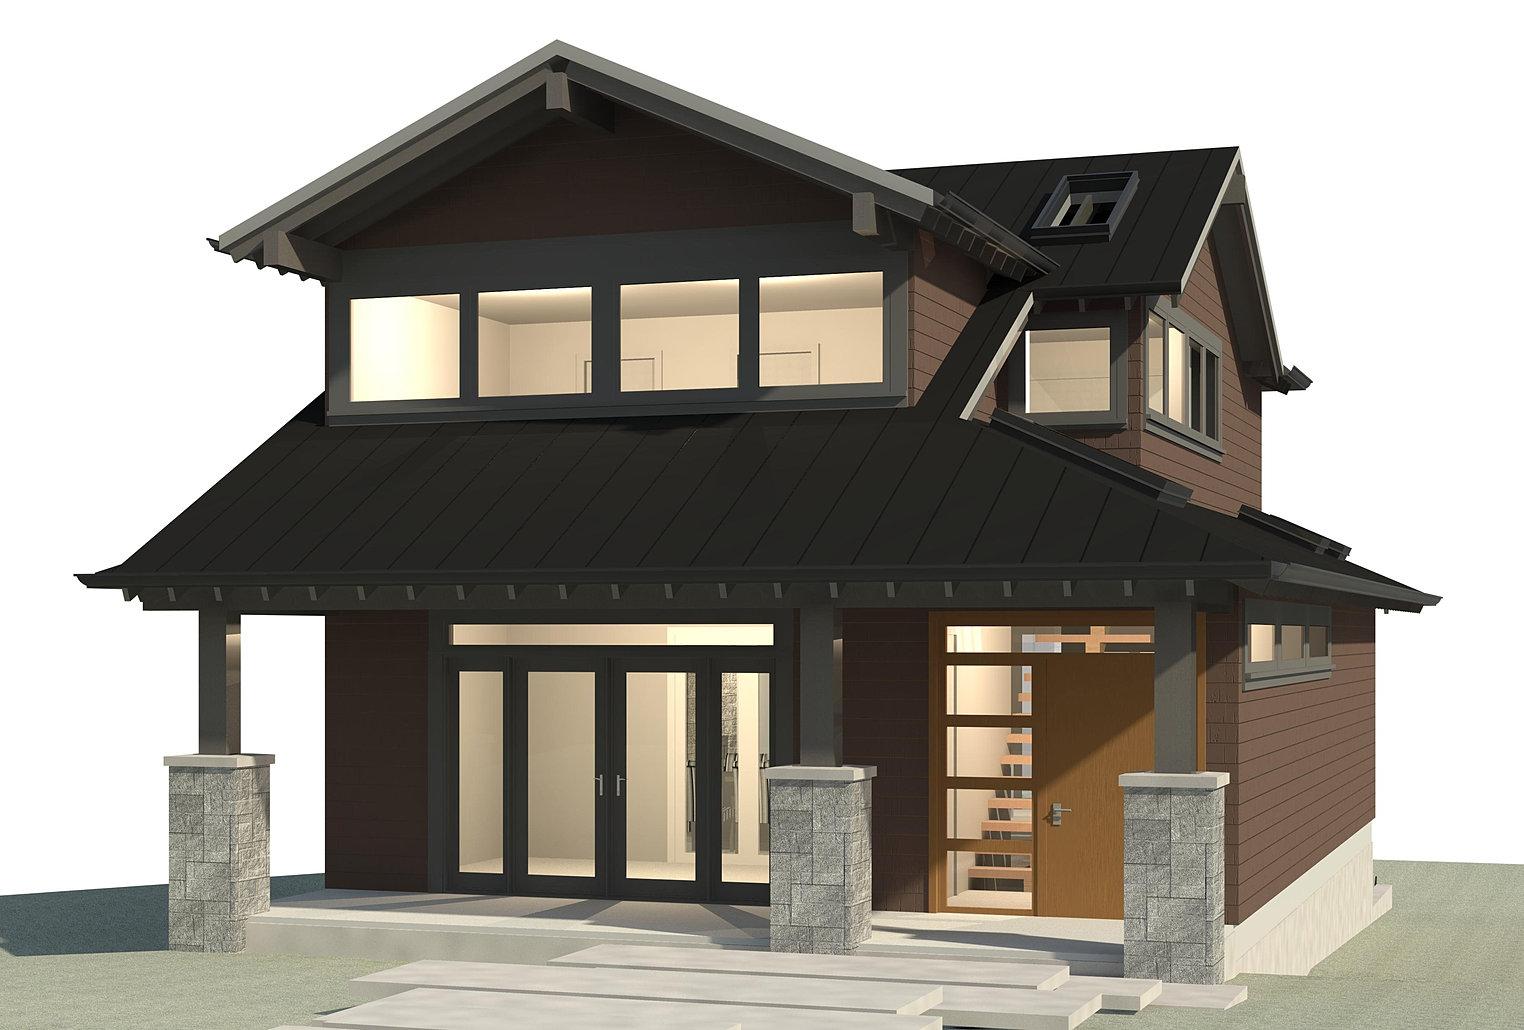 Connect design ltd retail design residential design for West coast home plans bc